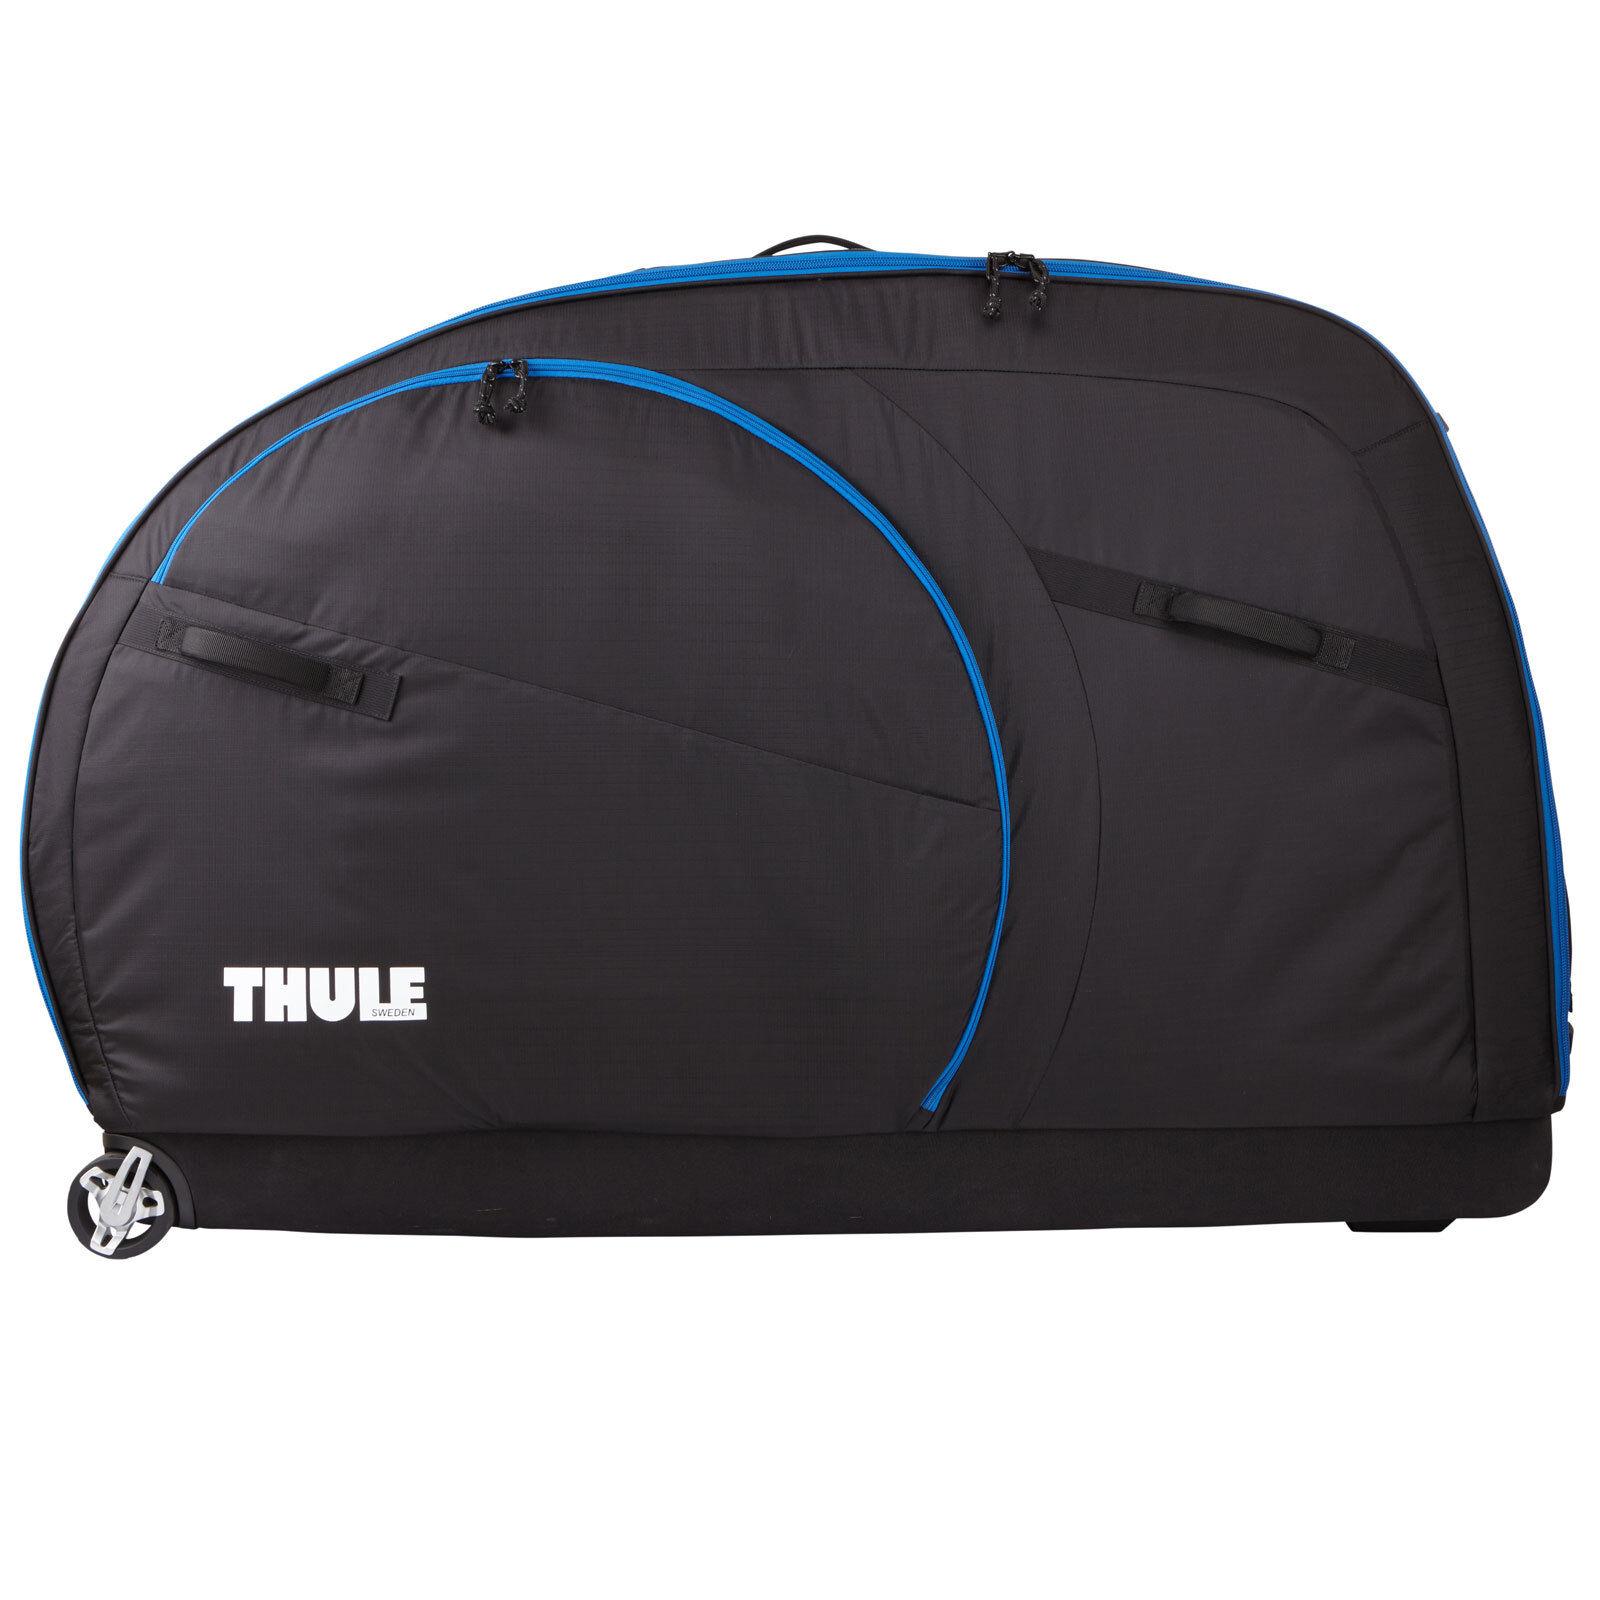 Thule Round Trip Traveler Vélo Transport-sac Bike-Sac Softshell-valise